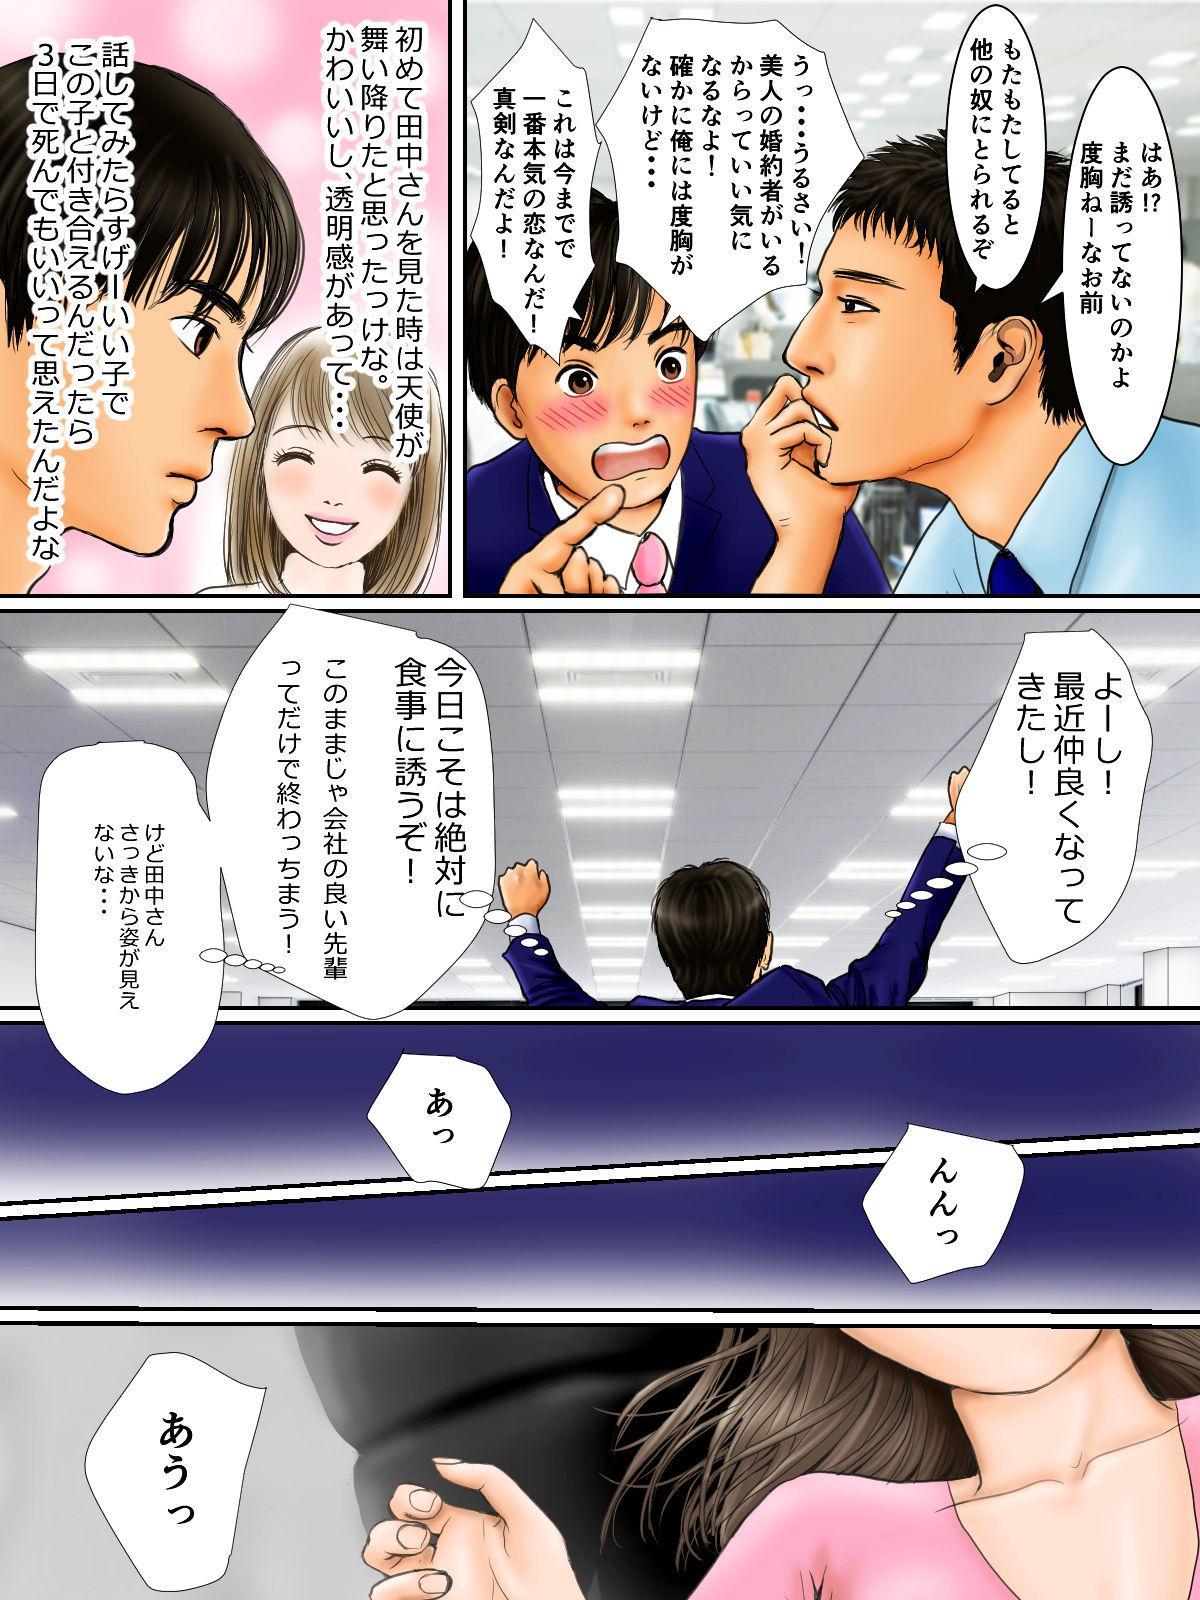 Yuumei Kigyou no Jittai 7